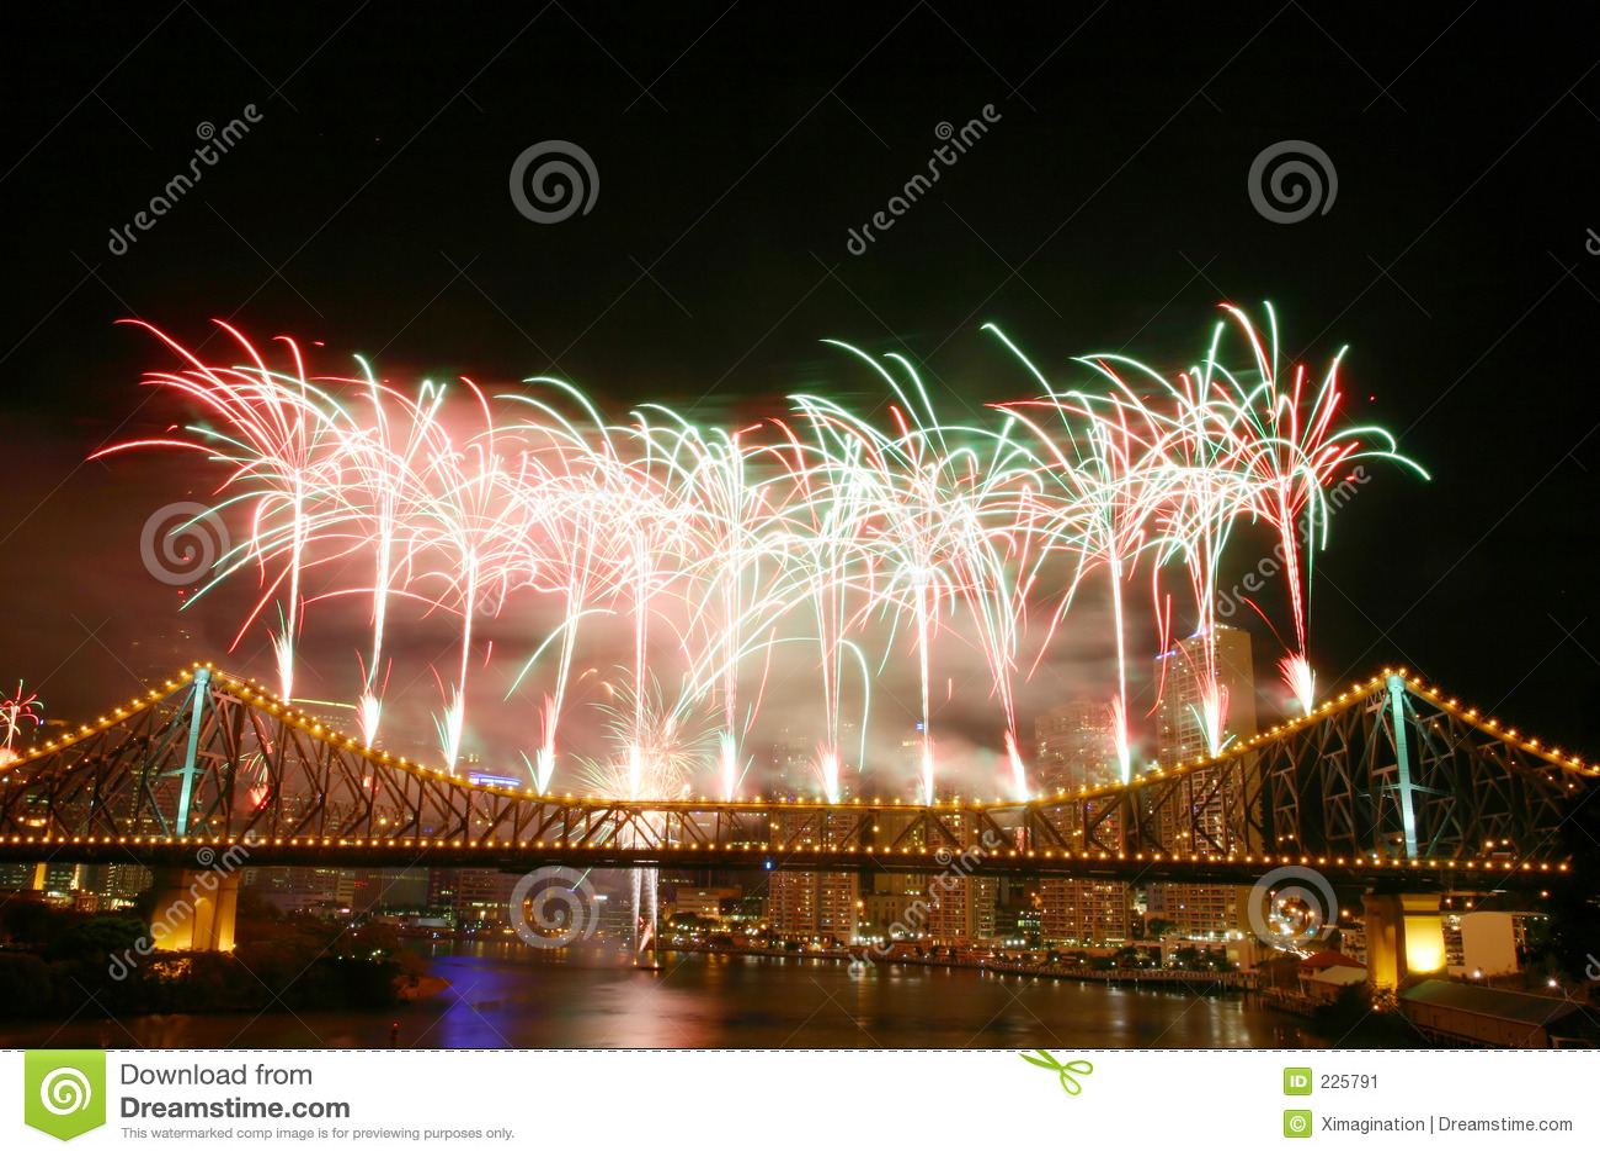 Download Fireworks at Story Bridge stock image. Image of festival - 225791